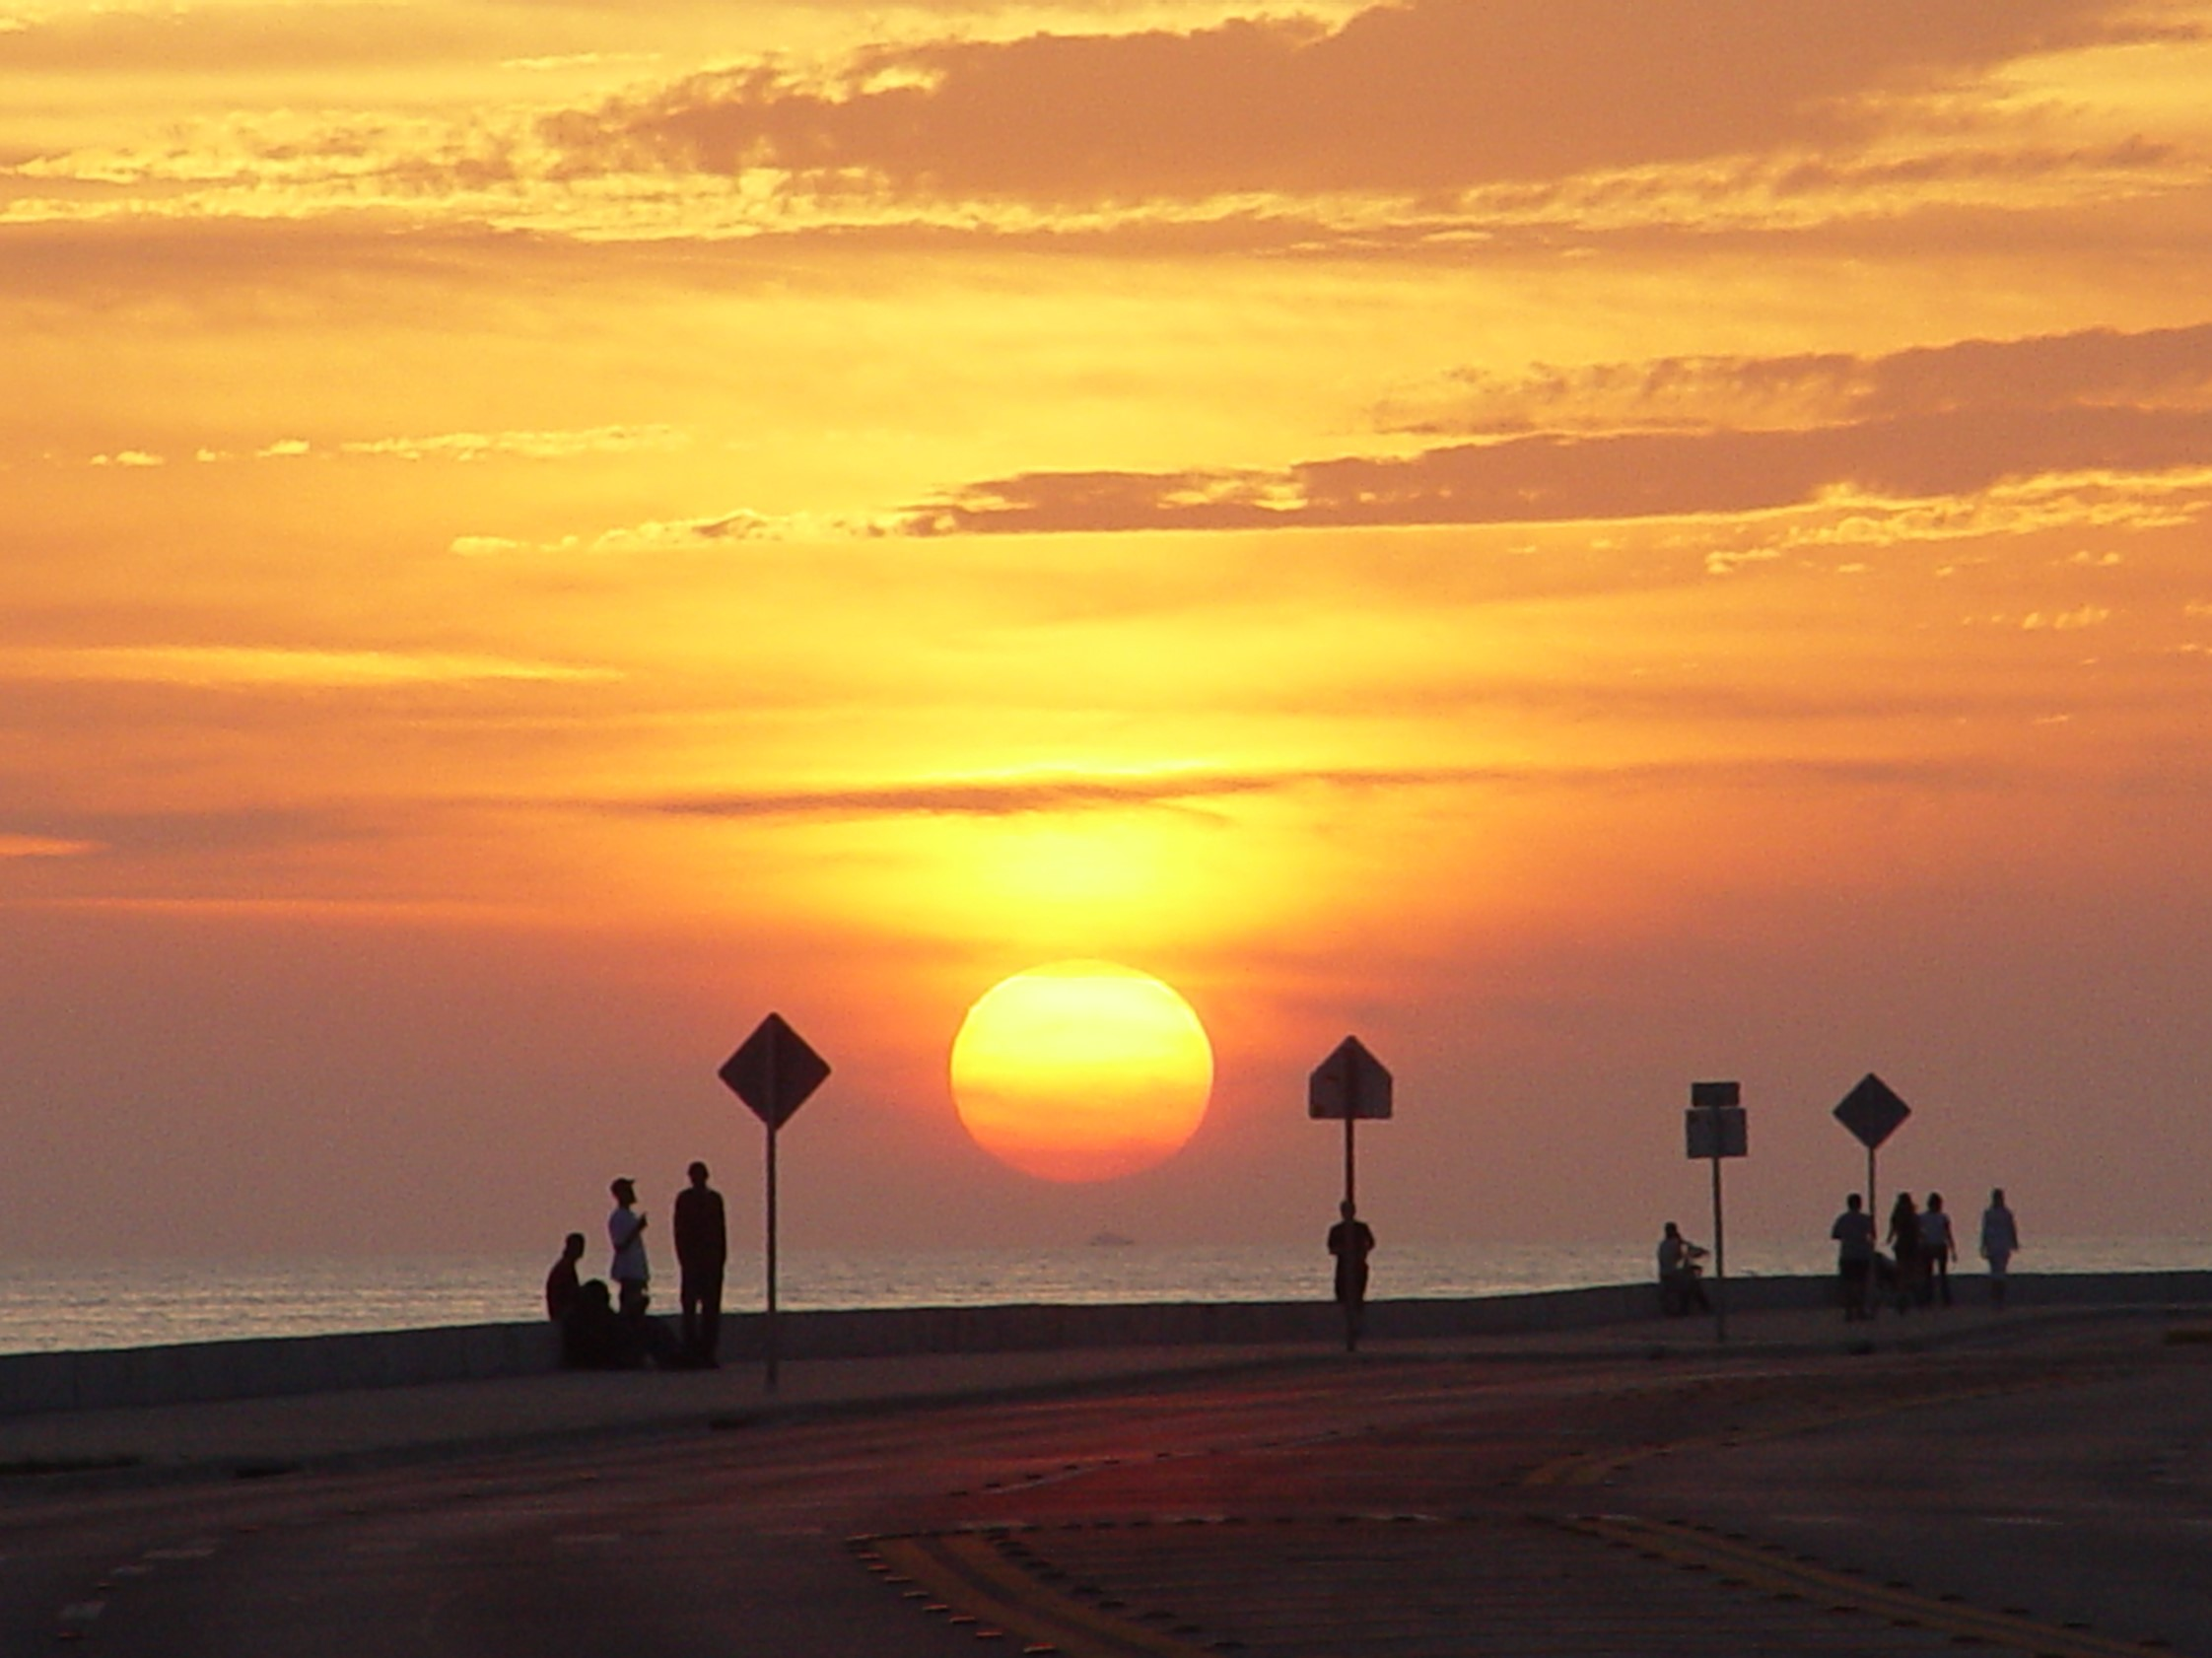 6.KW281.Sunset1